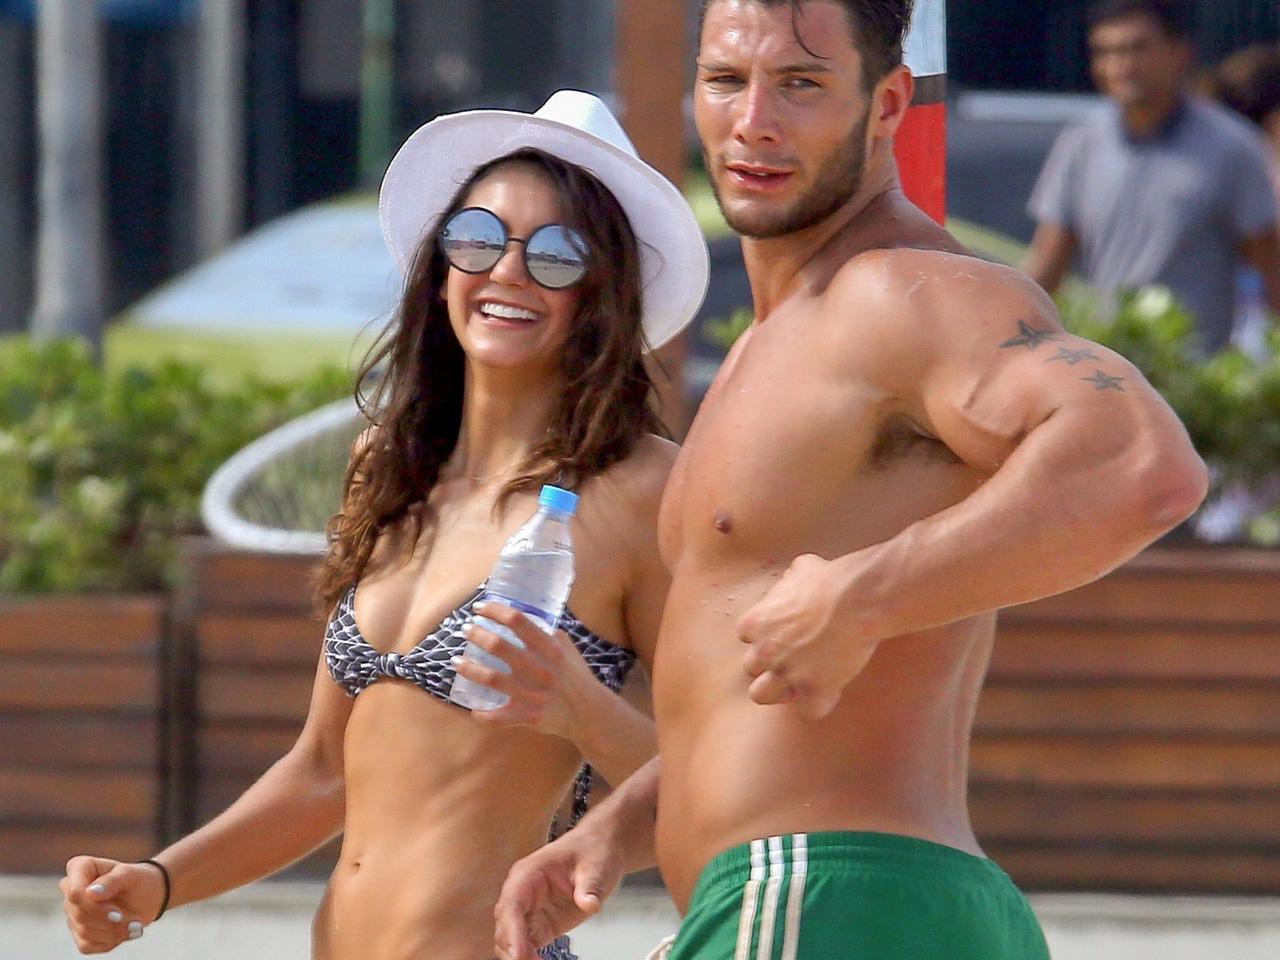 Rosie jones sexy topless 9 Photos,Karina jelinek boobs Hot videos Maria menounos travel outfit lax airport,Kate Beckinsale Bikini Butt Pics